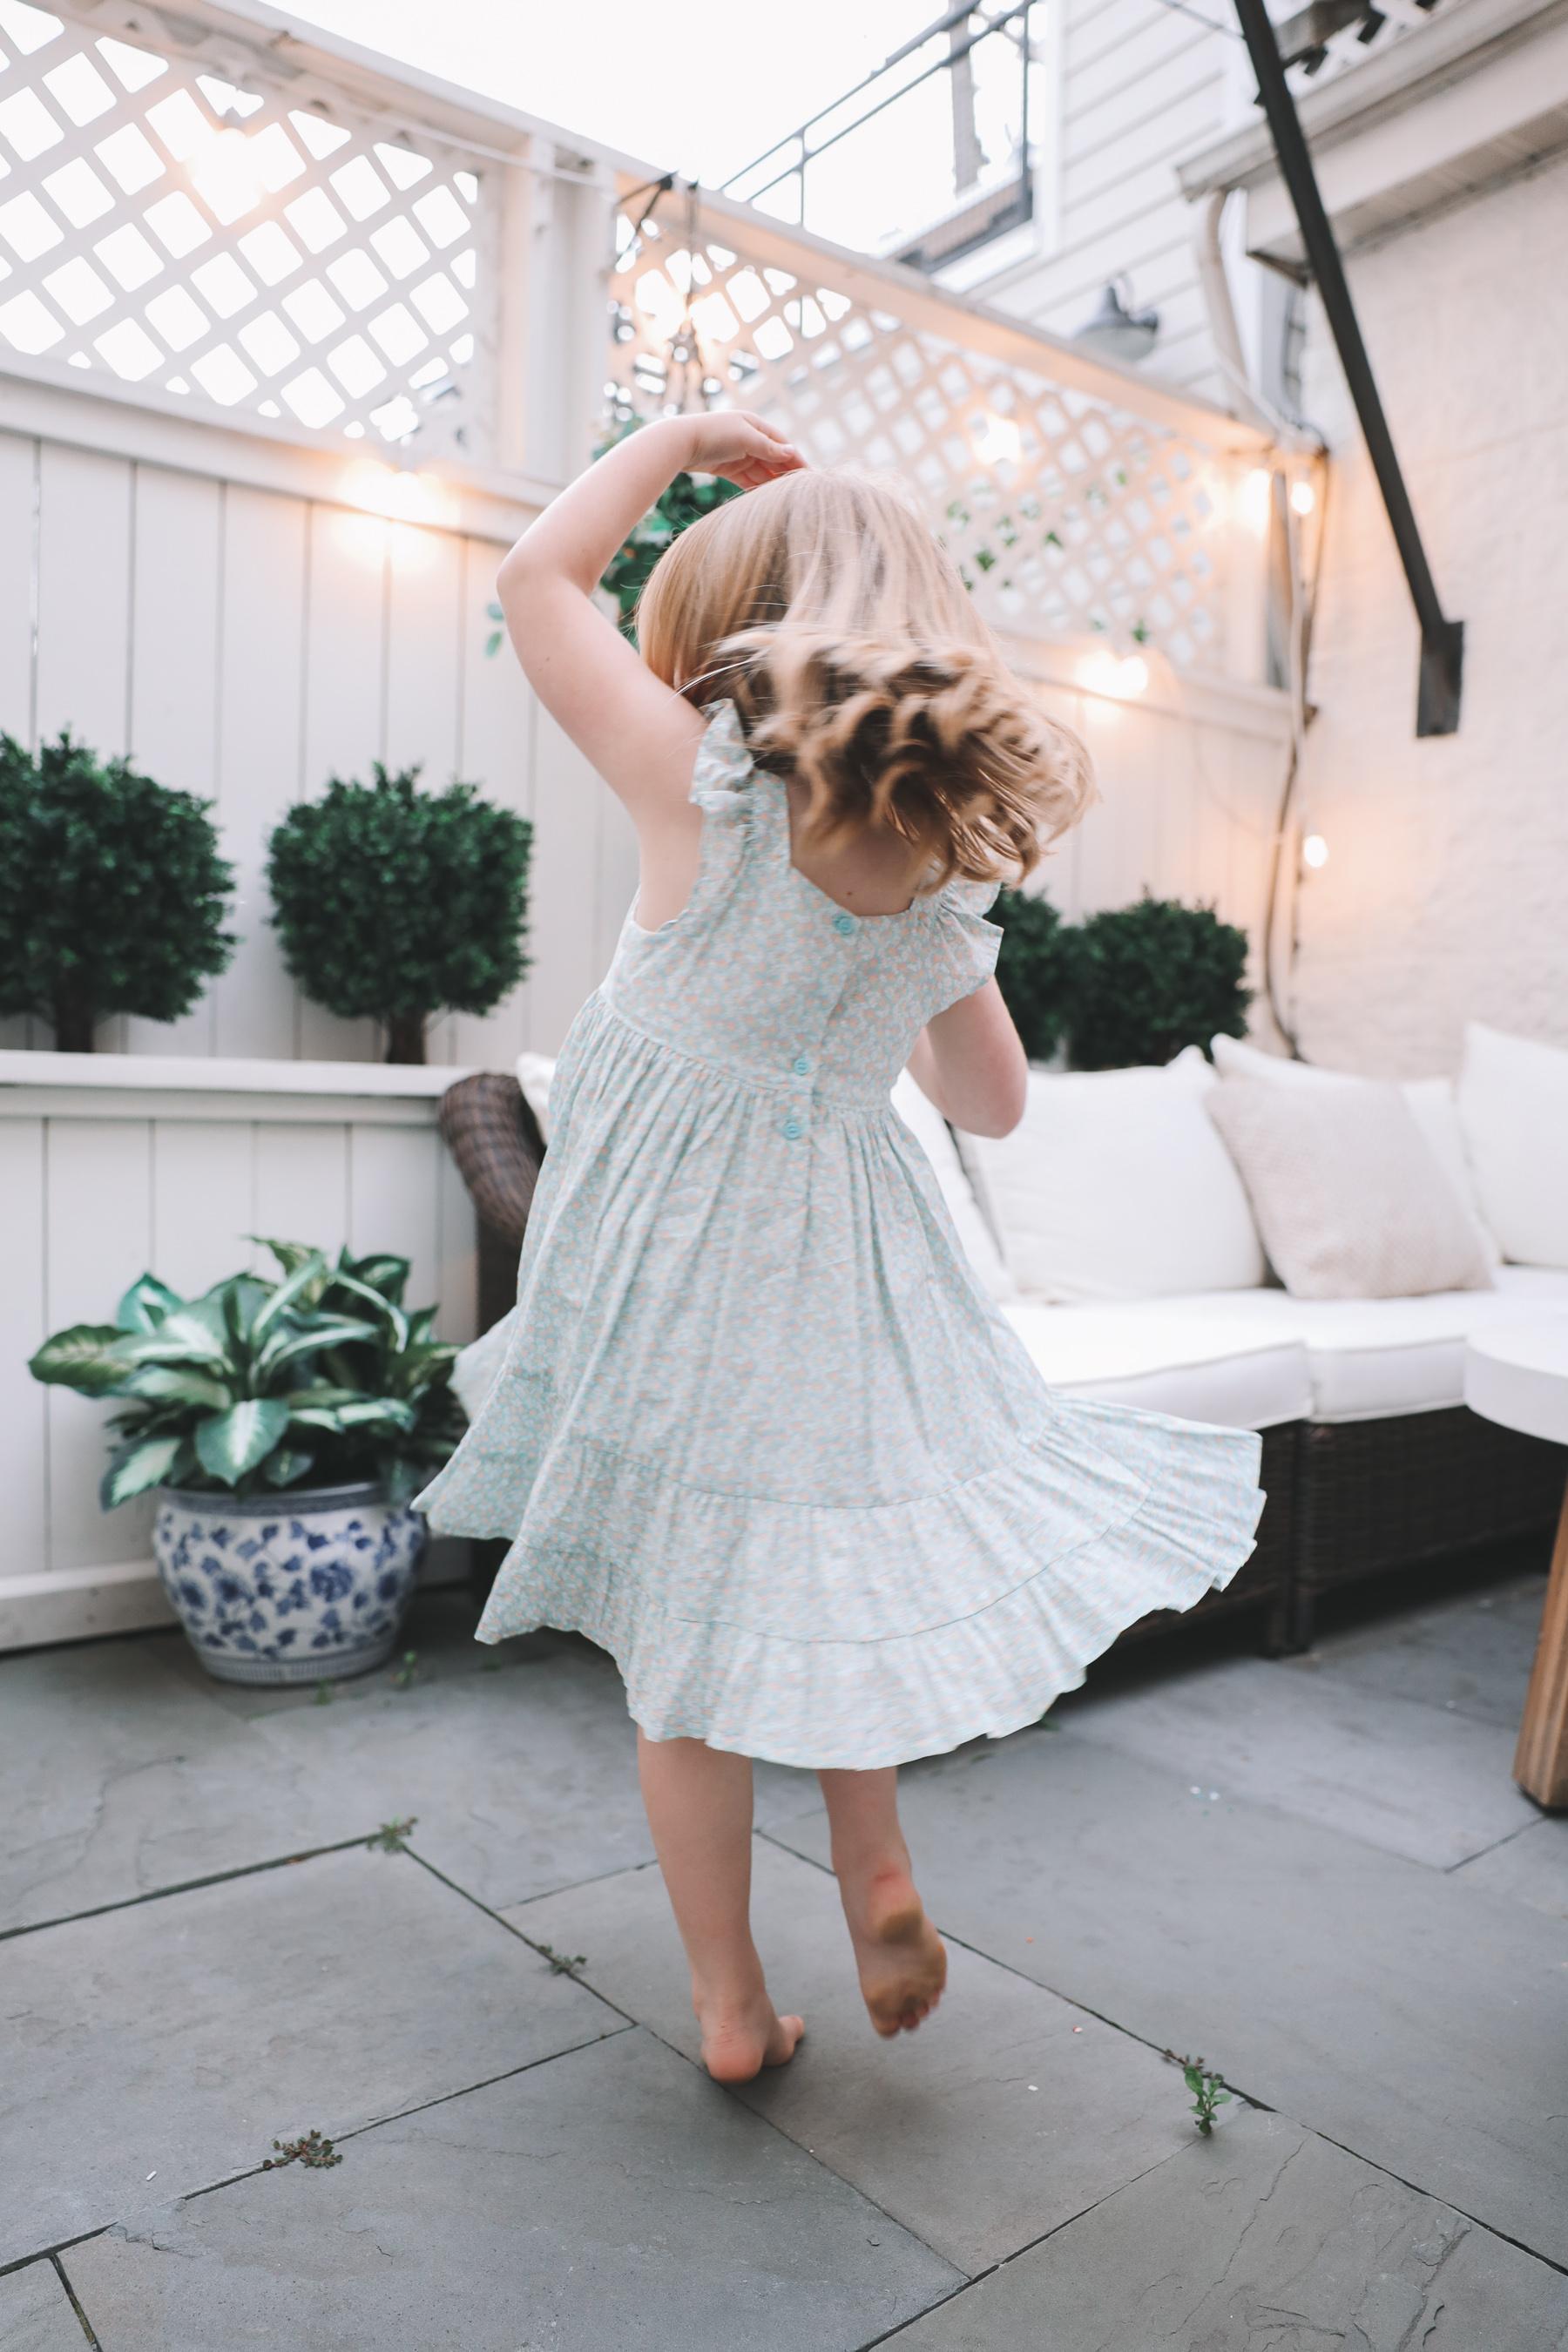 emma twirling